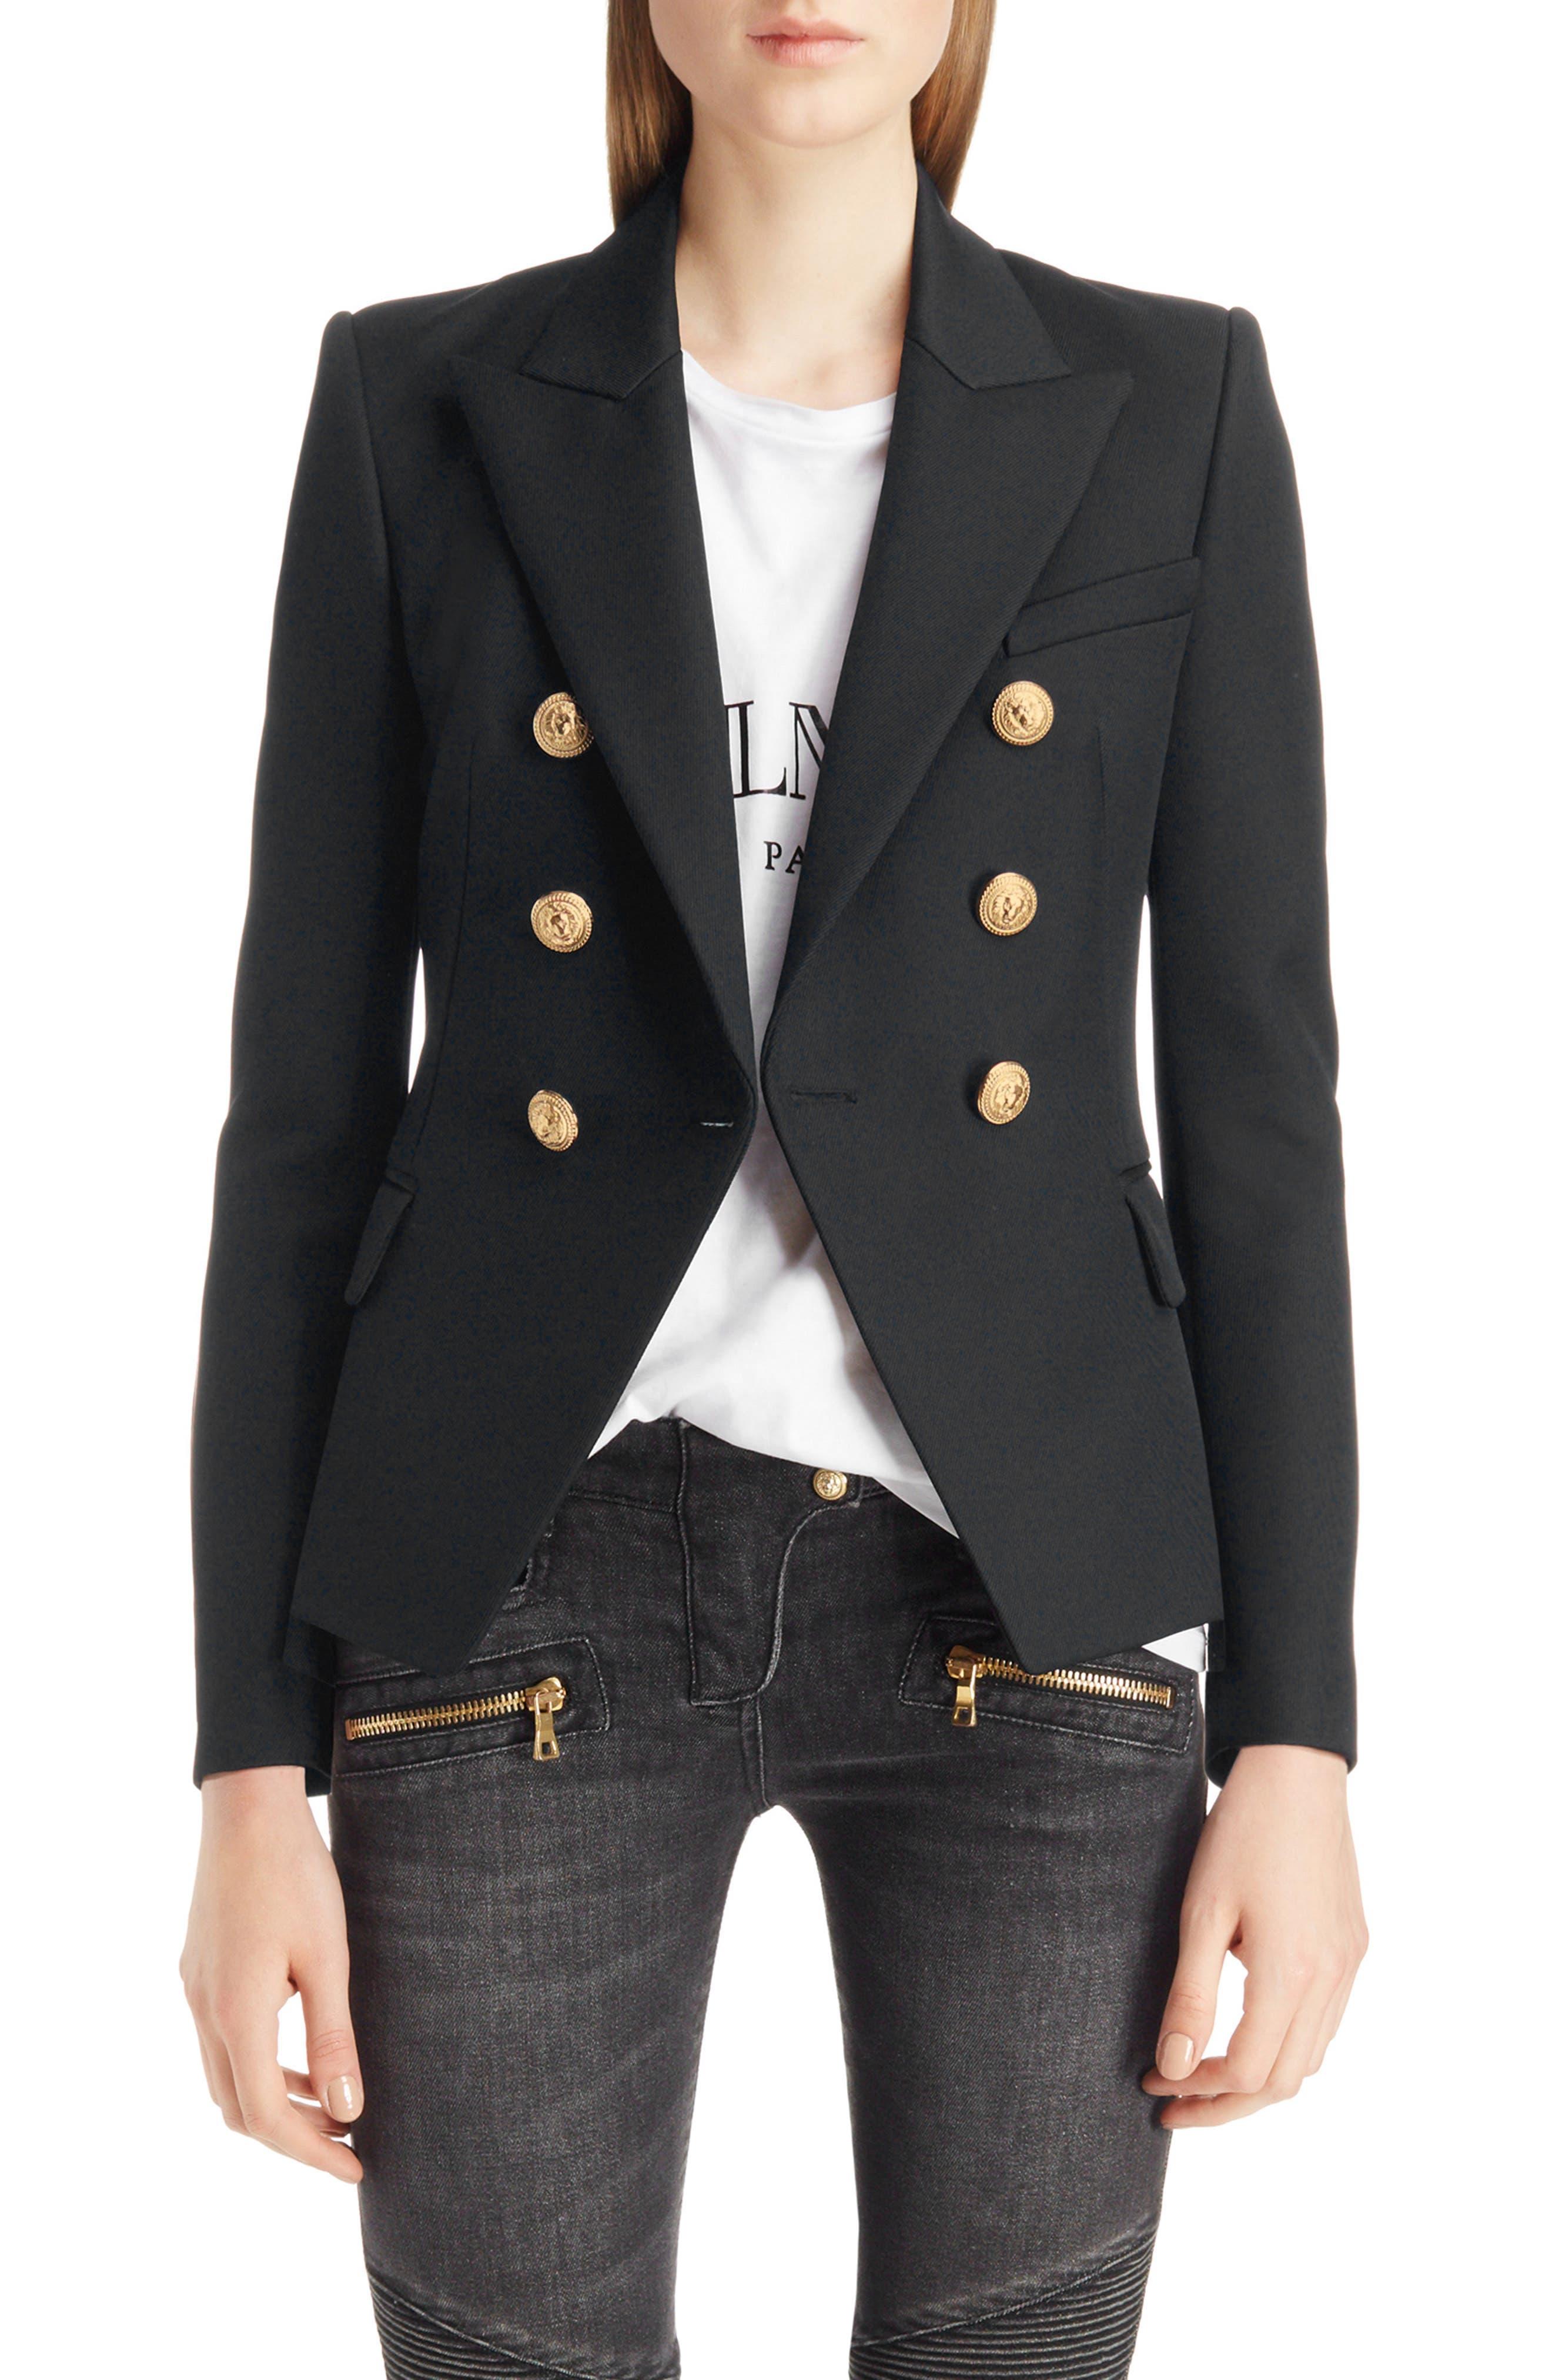 BALMAIN, Double Breasted Wool Blazer, Main thumbnail 1, color, BLACK/GOLD